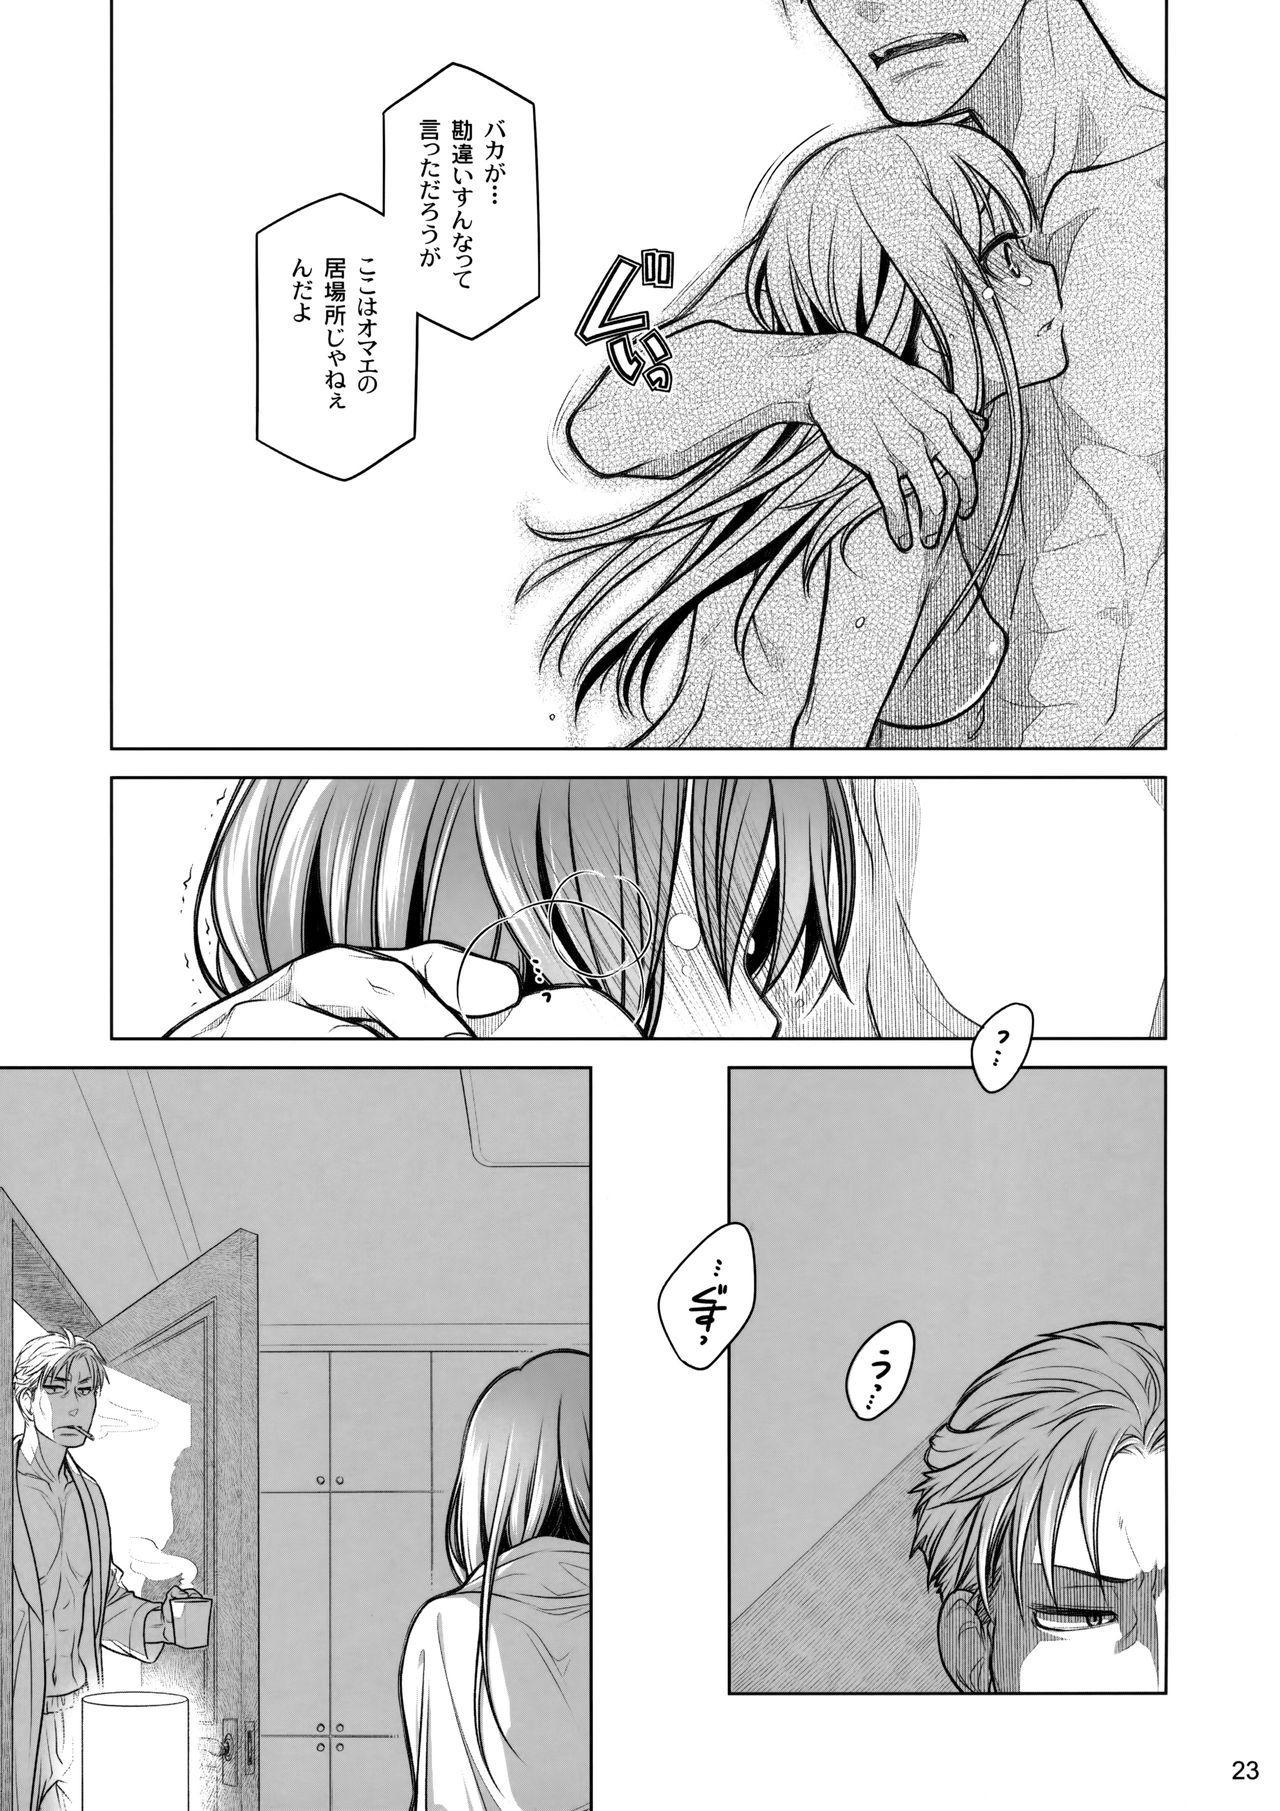 "Stay by Me Zenjitsutan Fragile S - Stay by me ""Prequel"" 21"